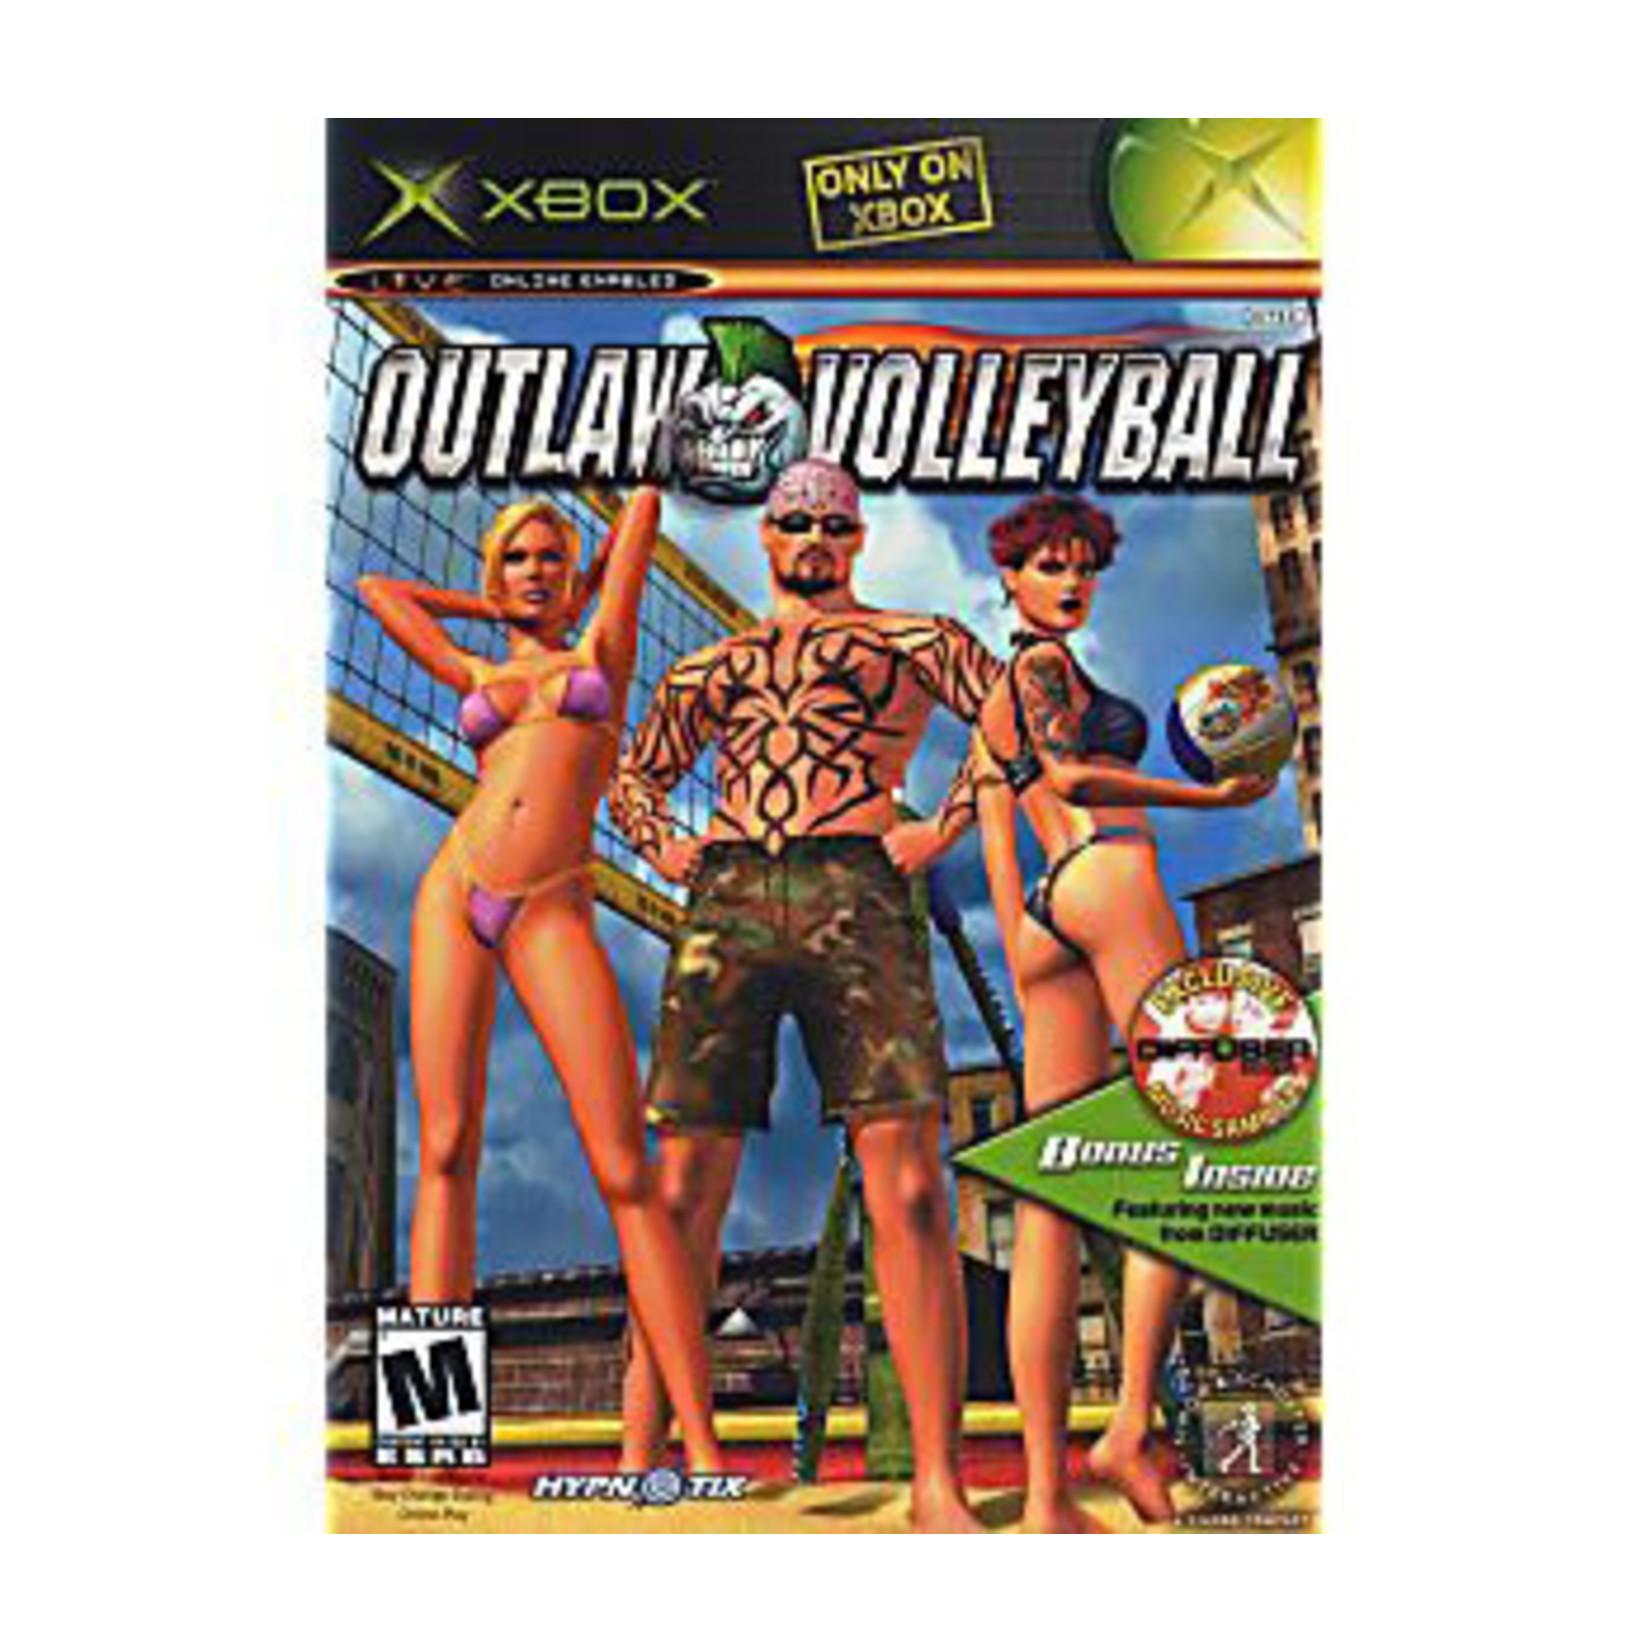 XBU-OUTLAW VOLLYBALL